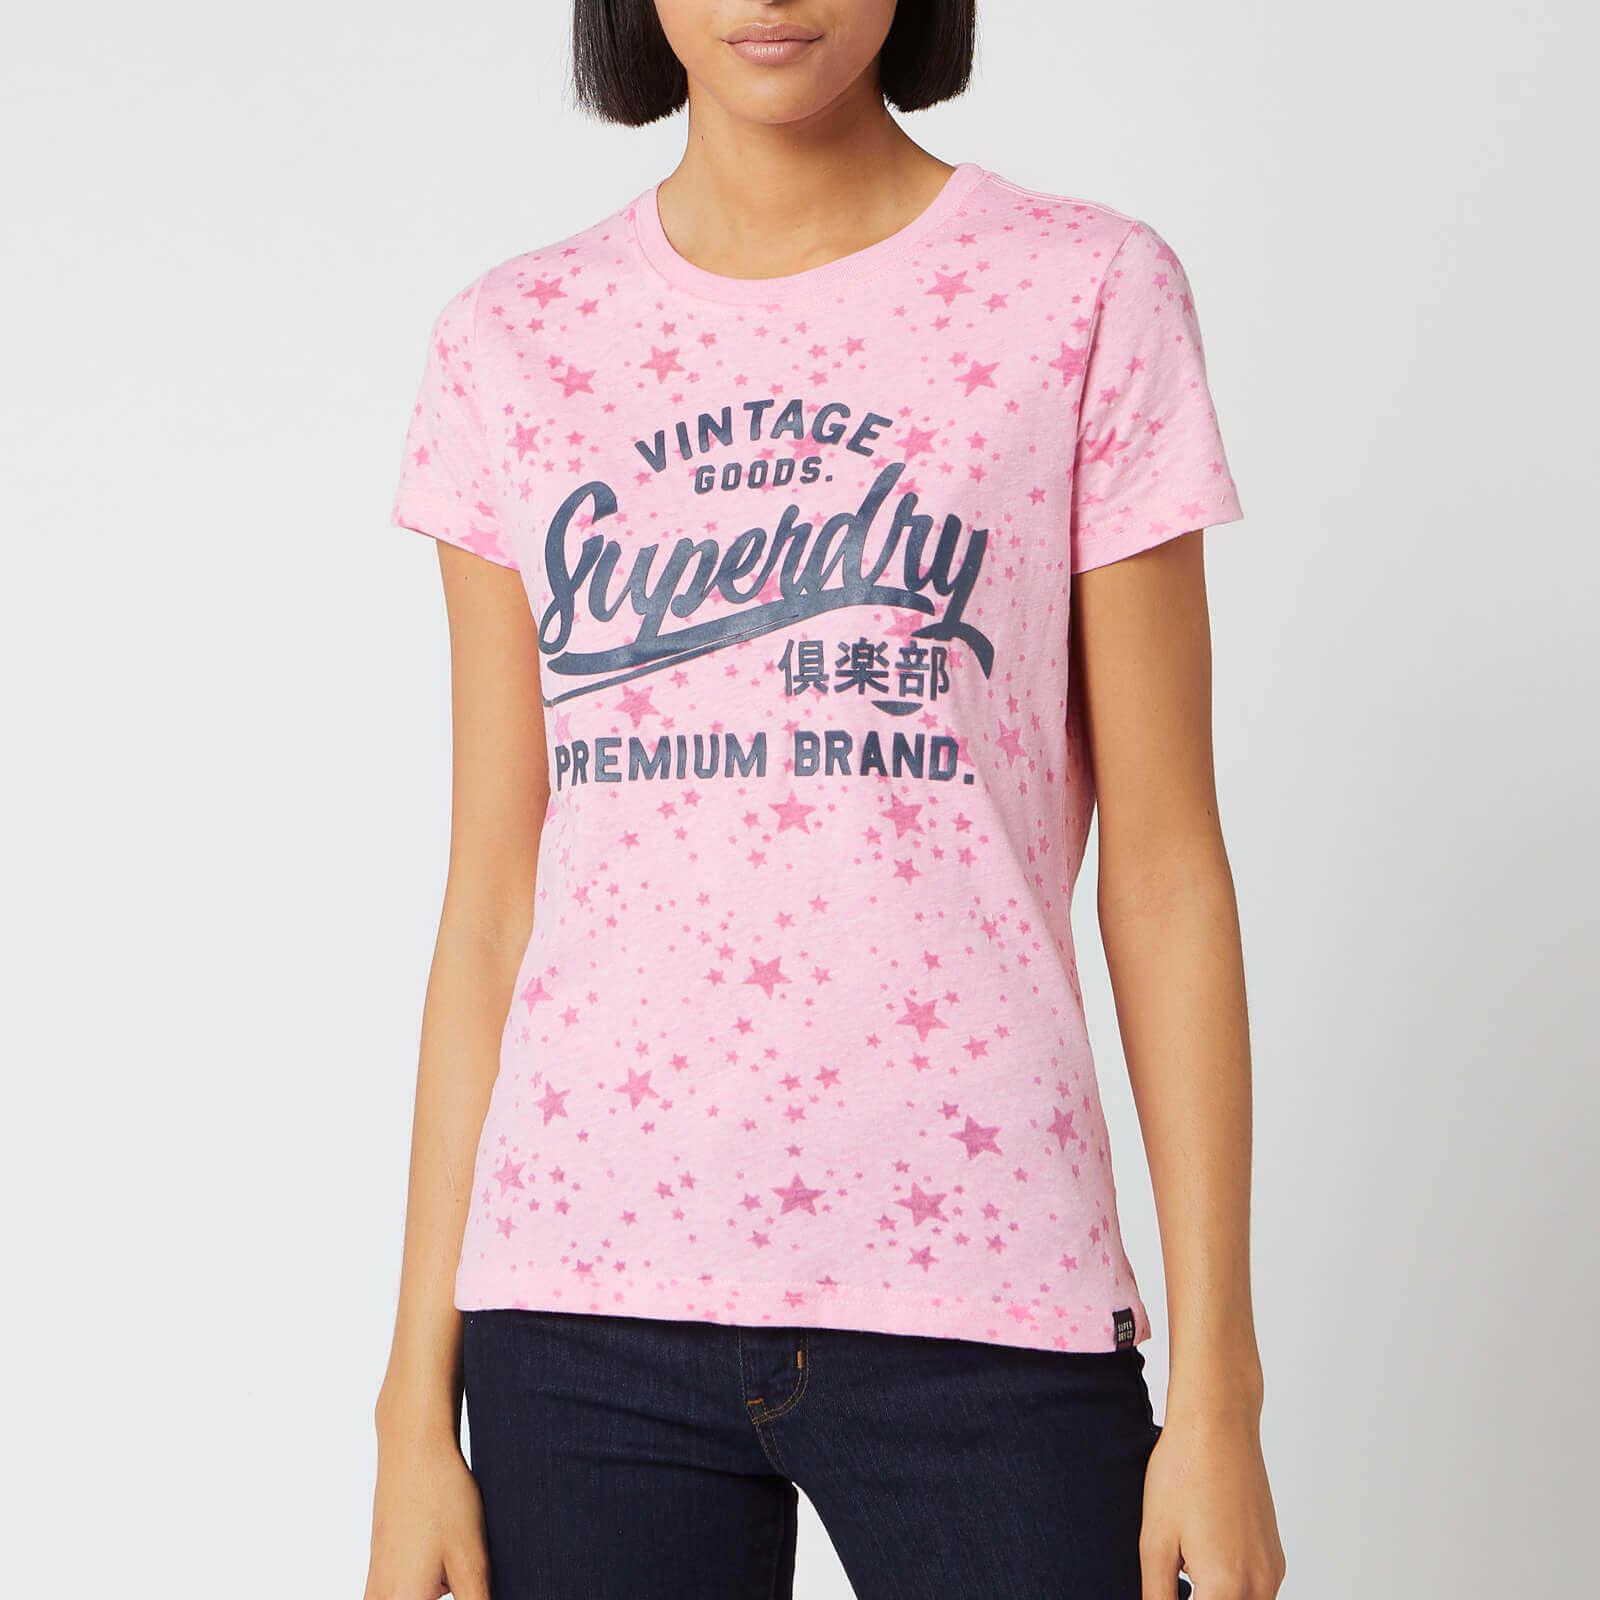 Superdry Women's Vintage Goods Star Aop Entry T-Shirt - Cherry Blossom Burn Out - UK 8 - Pink